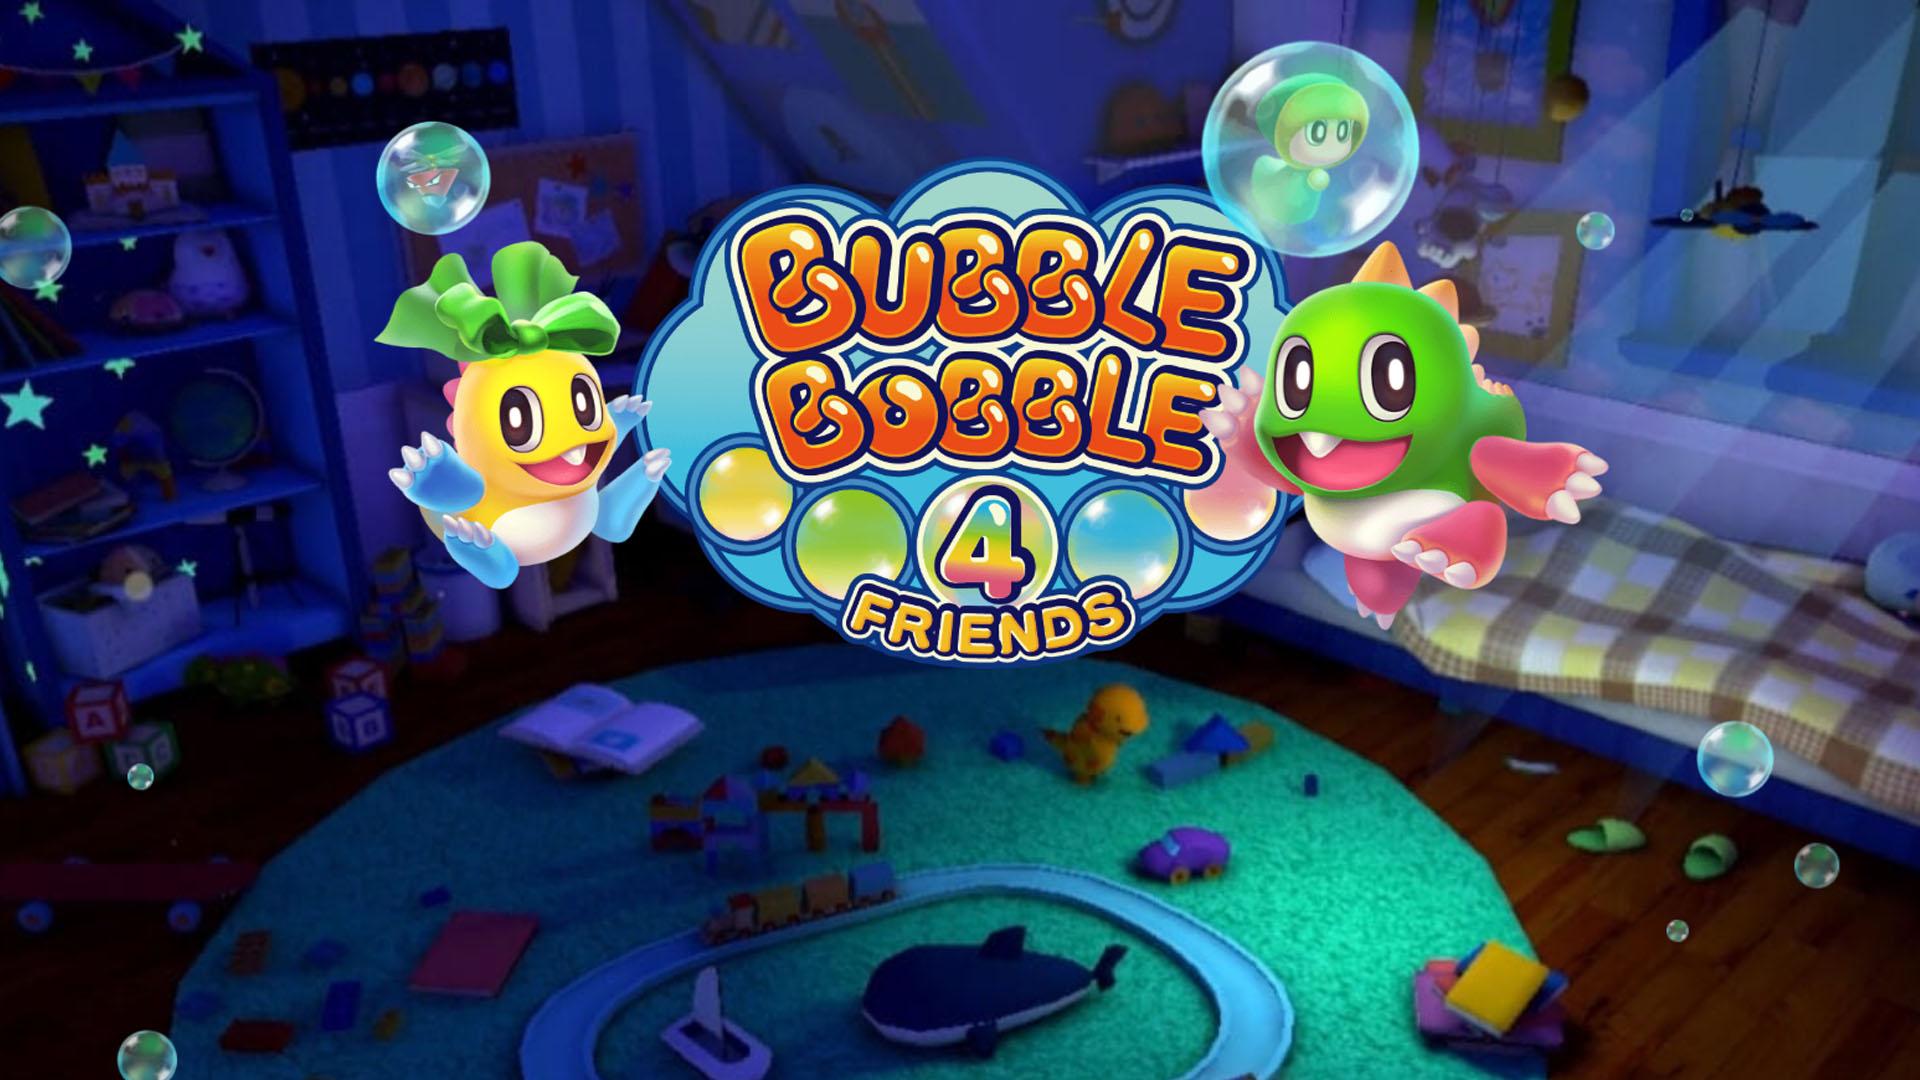 bubble bobble 4 friends video game wallpaper 69557